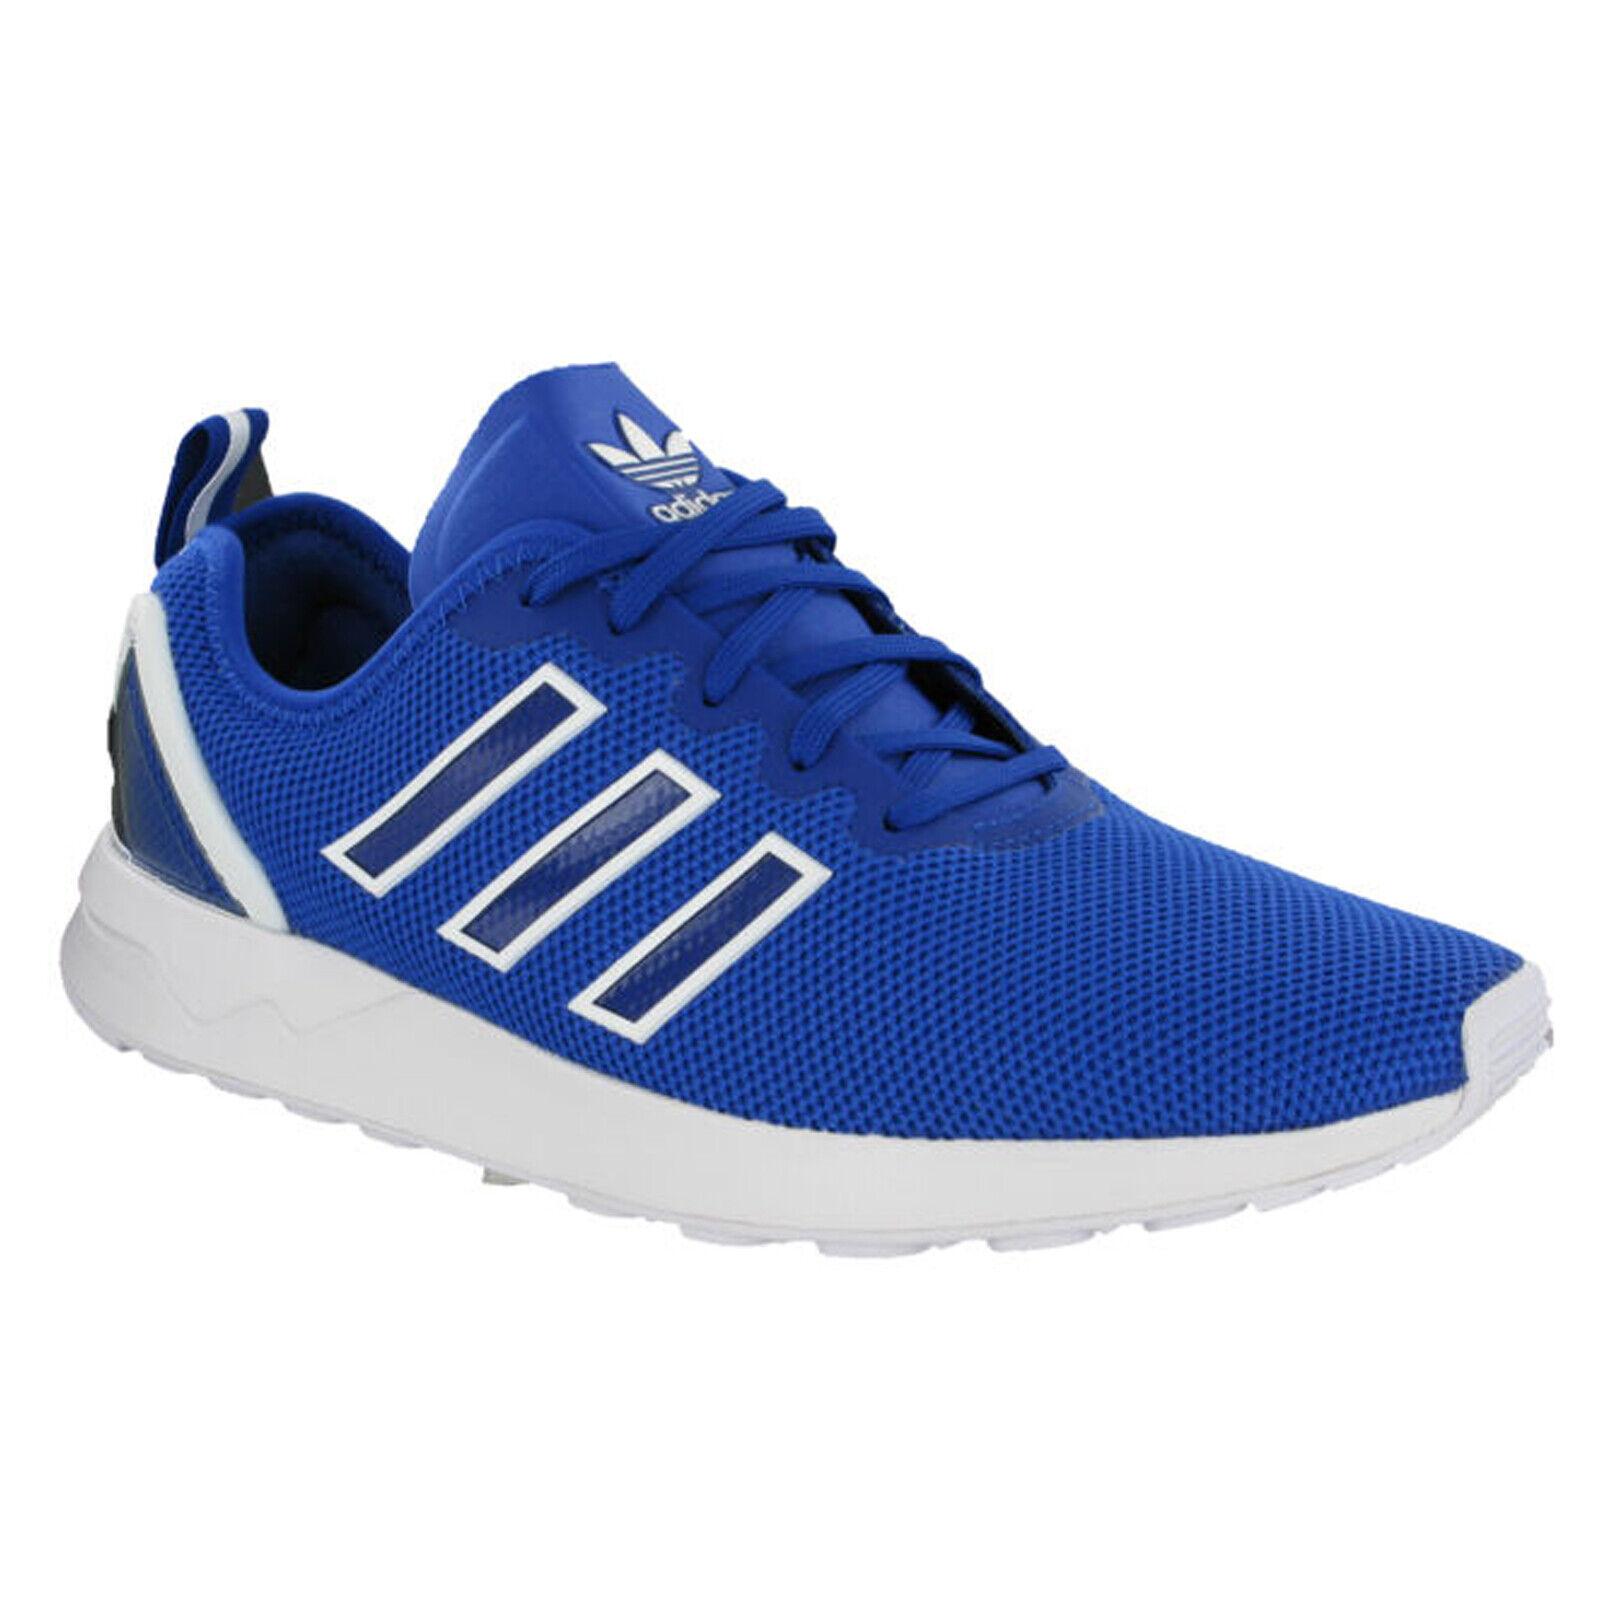 Herren Adidas Zx Flussmittel Adv Laufschuhe Sports Netz Blau